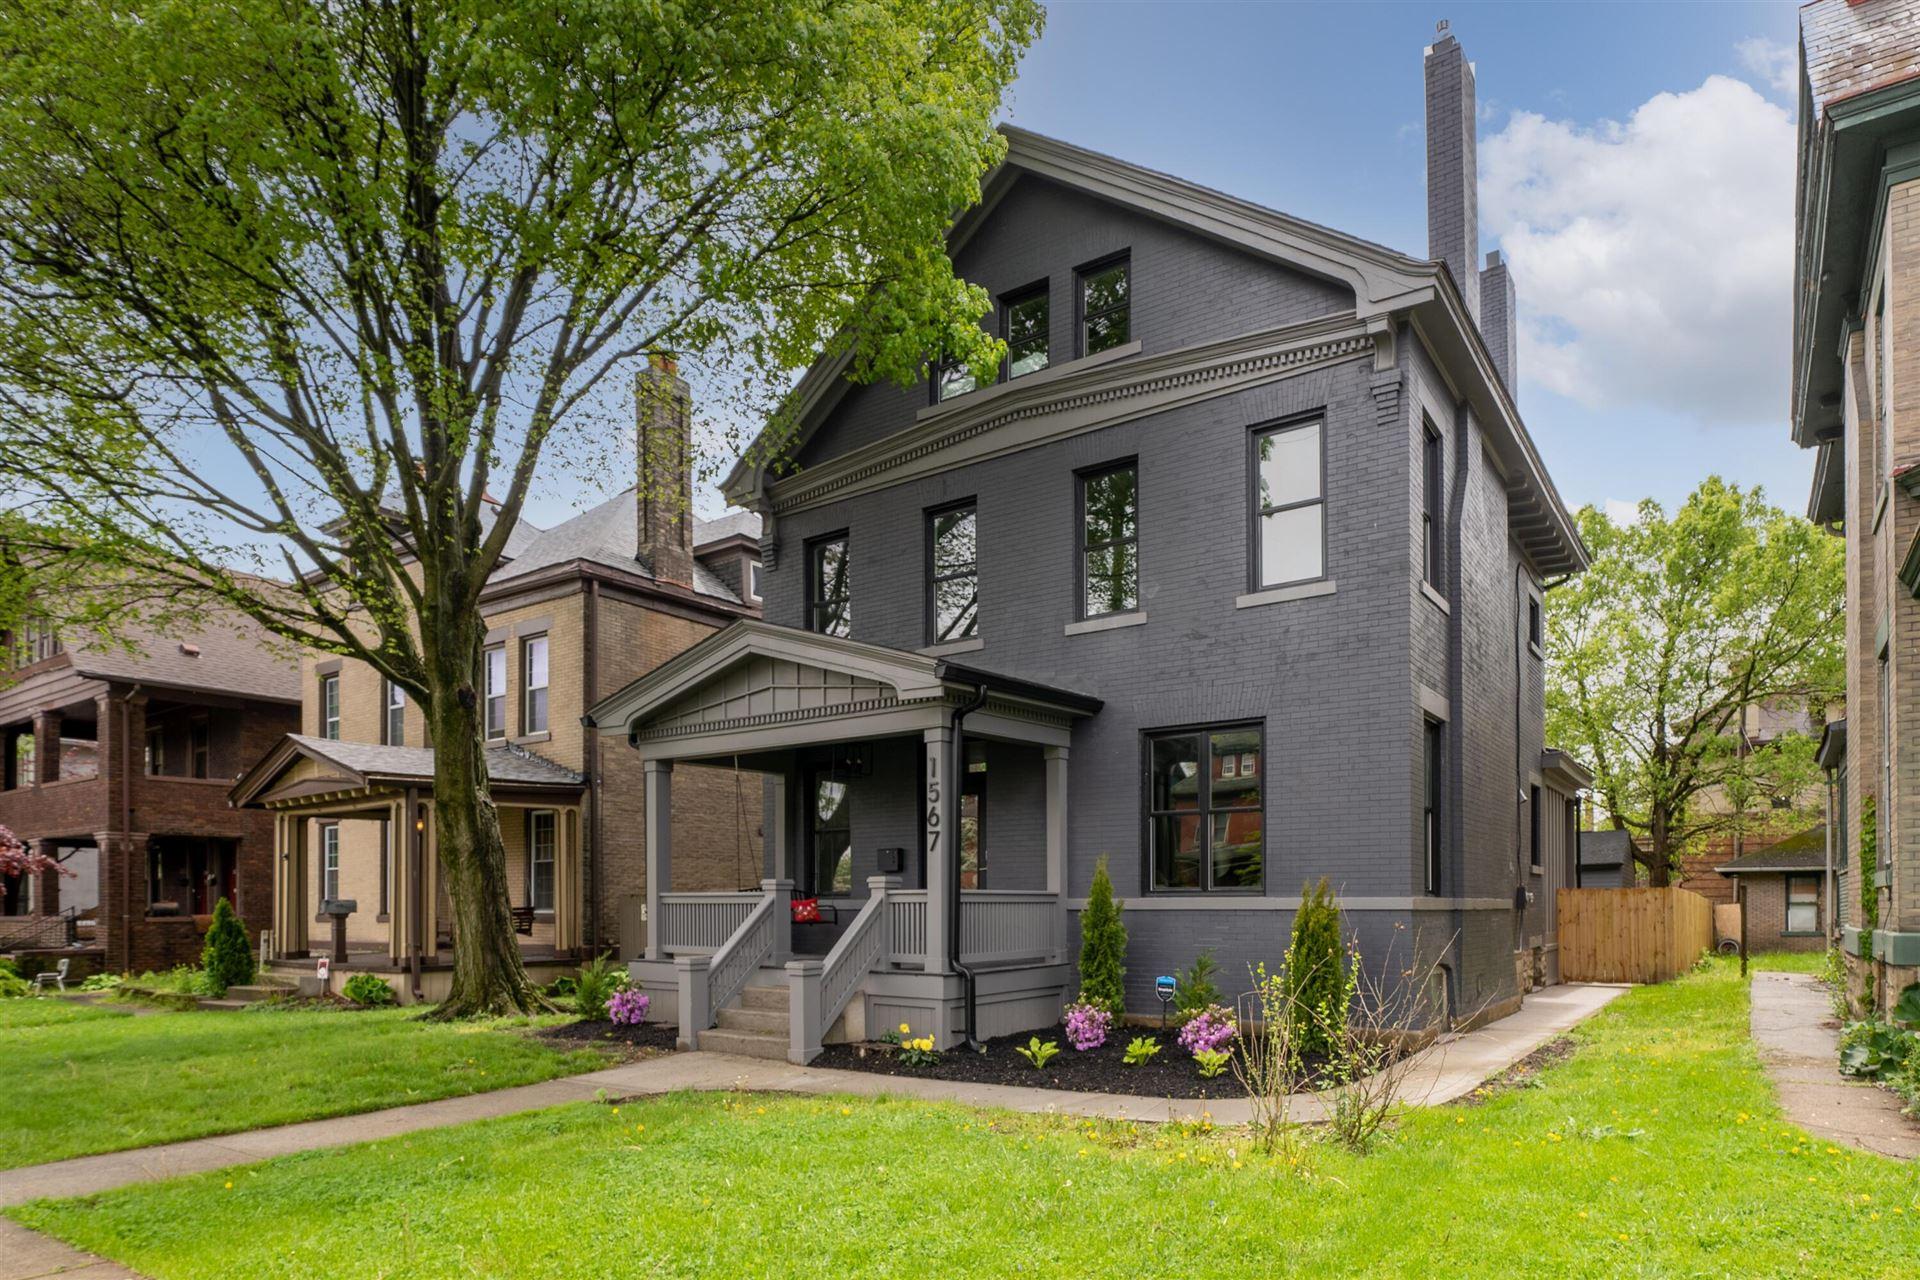 Photo of 1567 E Long Street, Columbus, OH 43203 (MLS # 221015910)